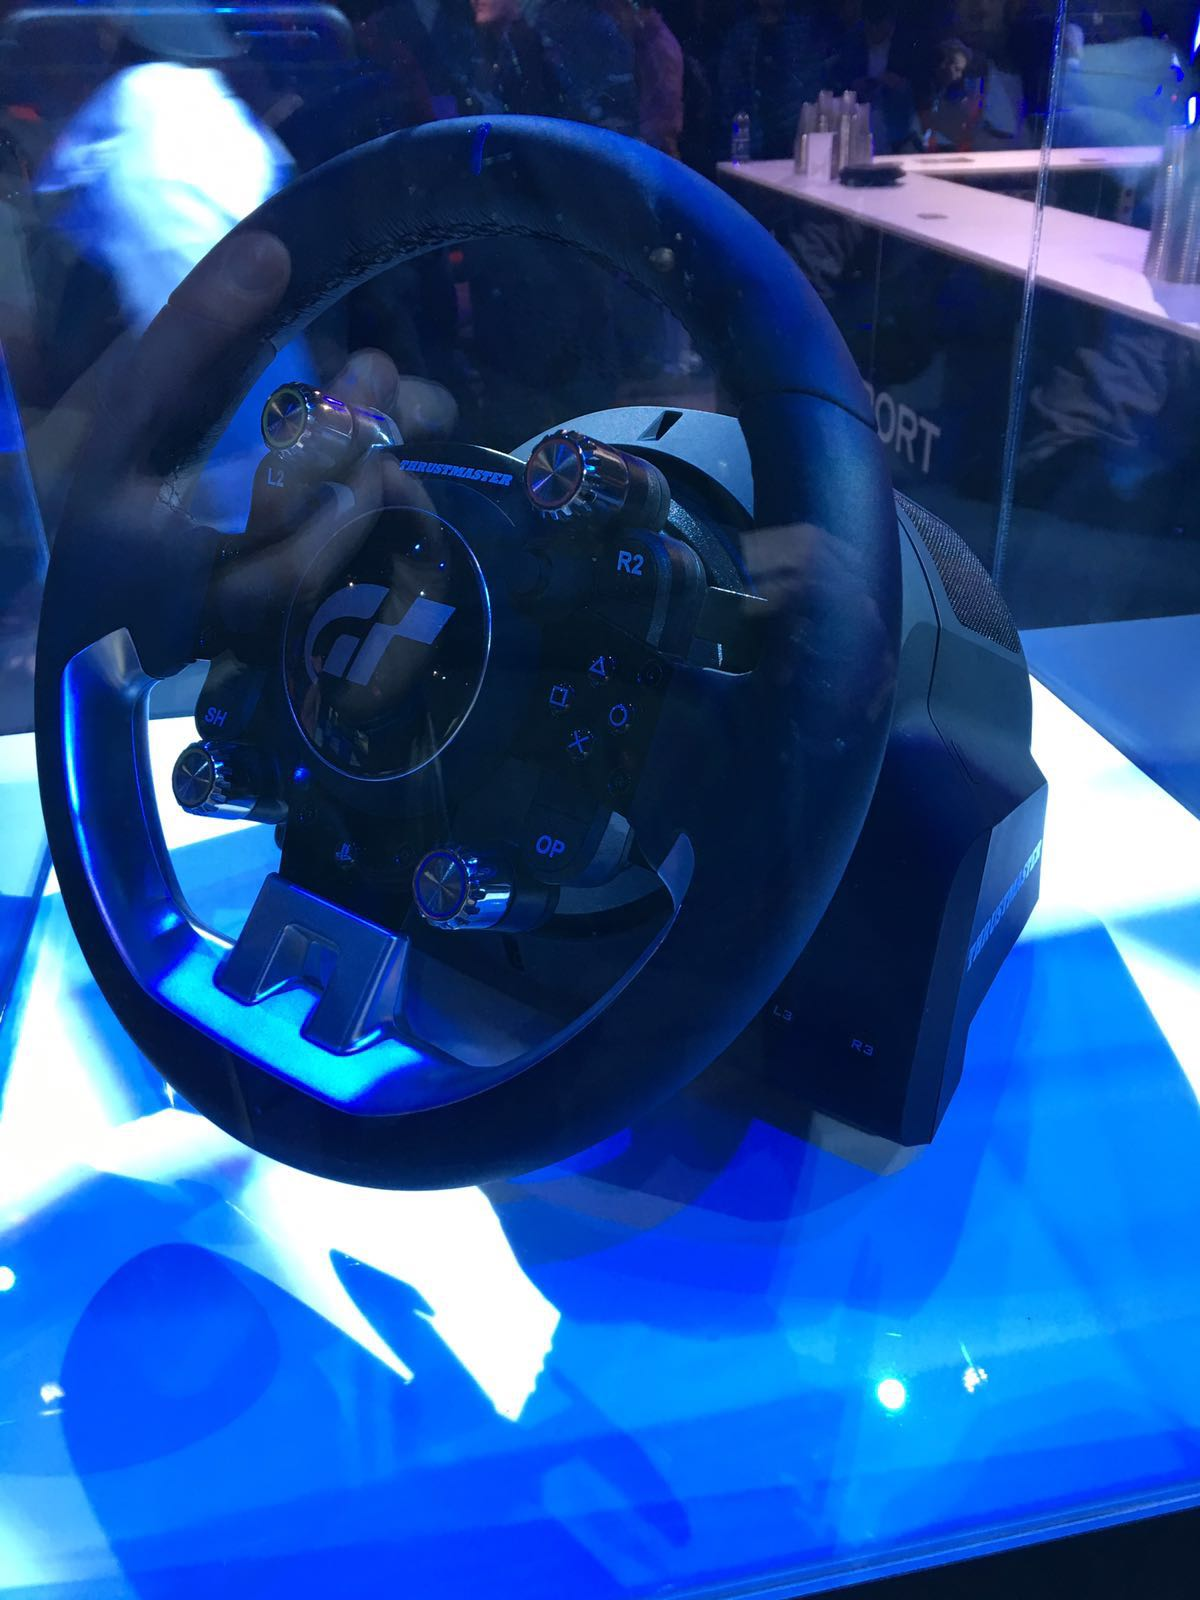 gt sport thrustmaster wheel